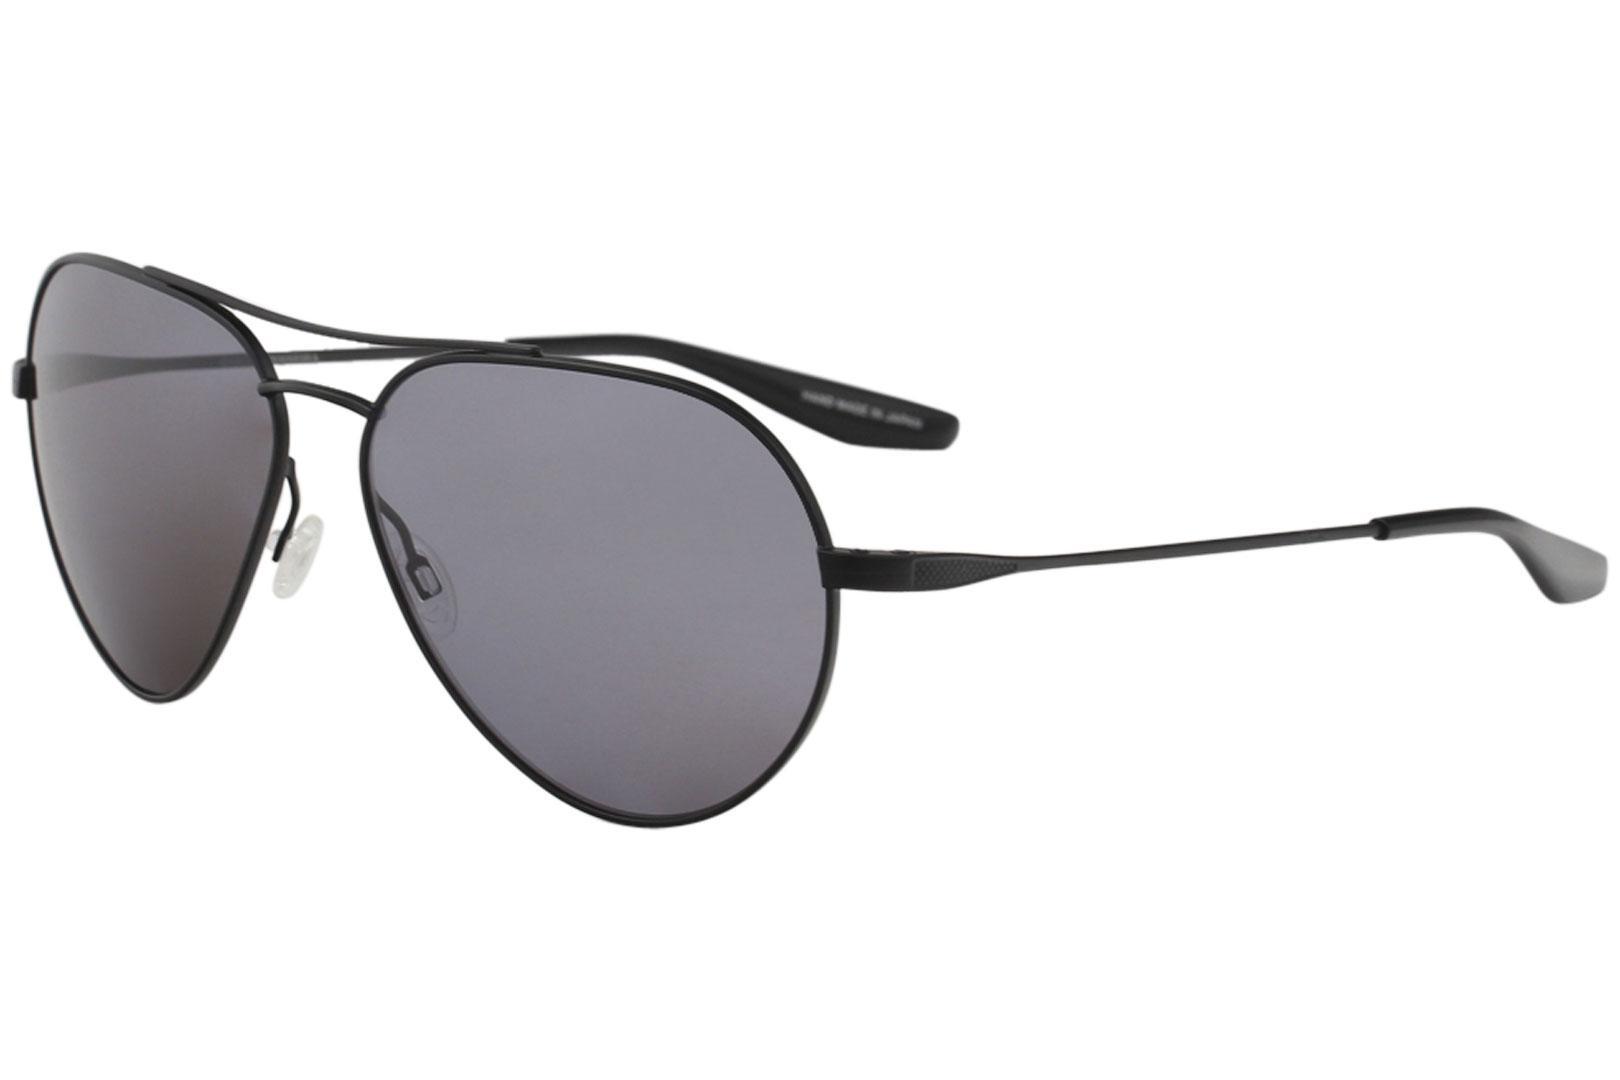 0b4d217bf31 Barton Perreira Men s Commodore Fashion Pilot Polarized Sunglasses by  Barton Perreira. Touch to zoom